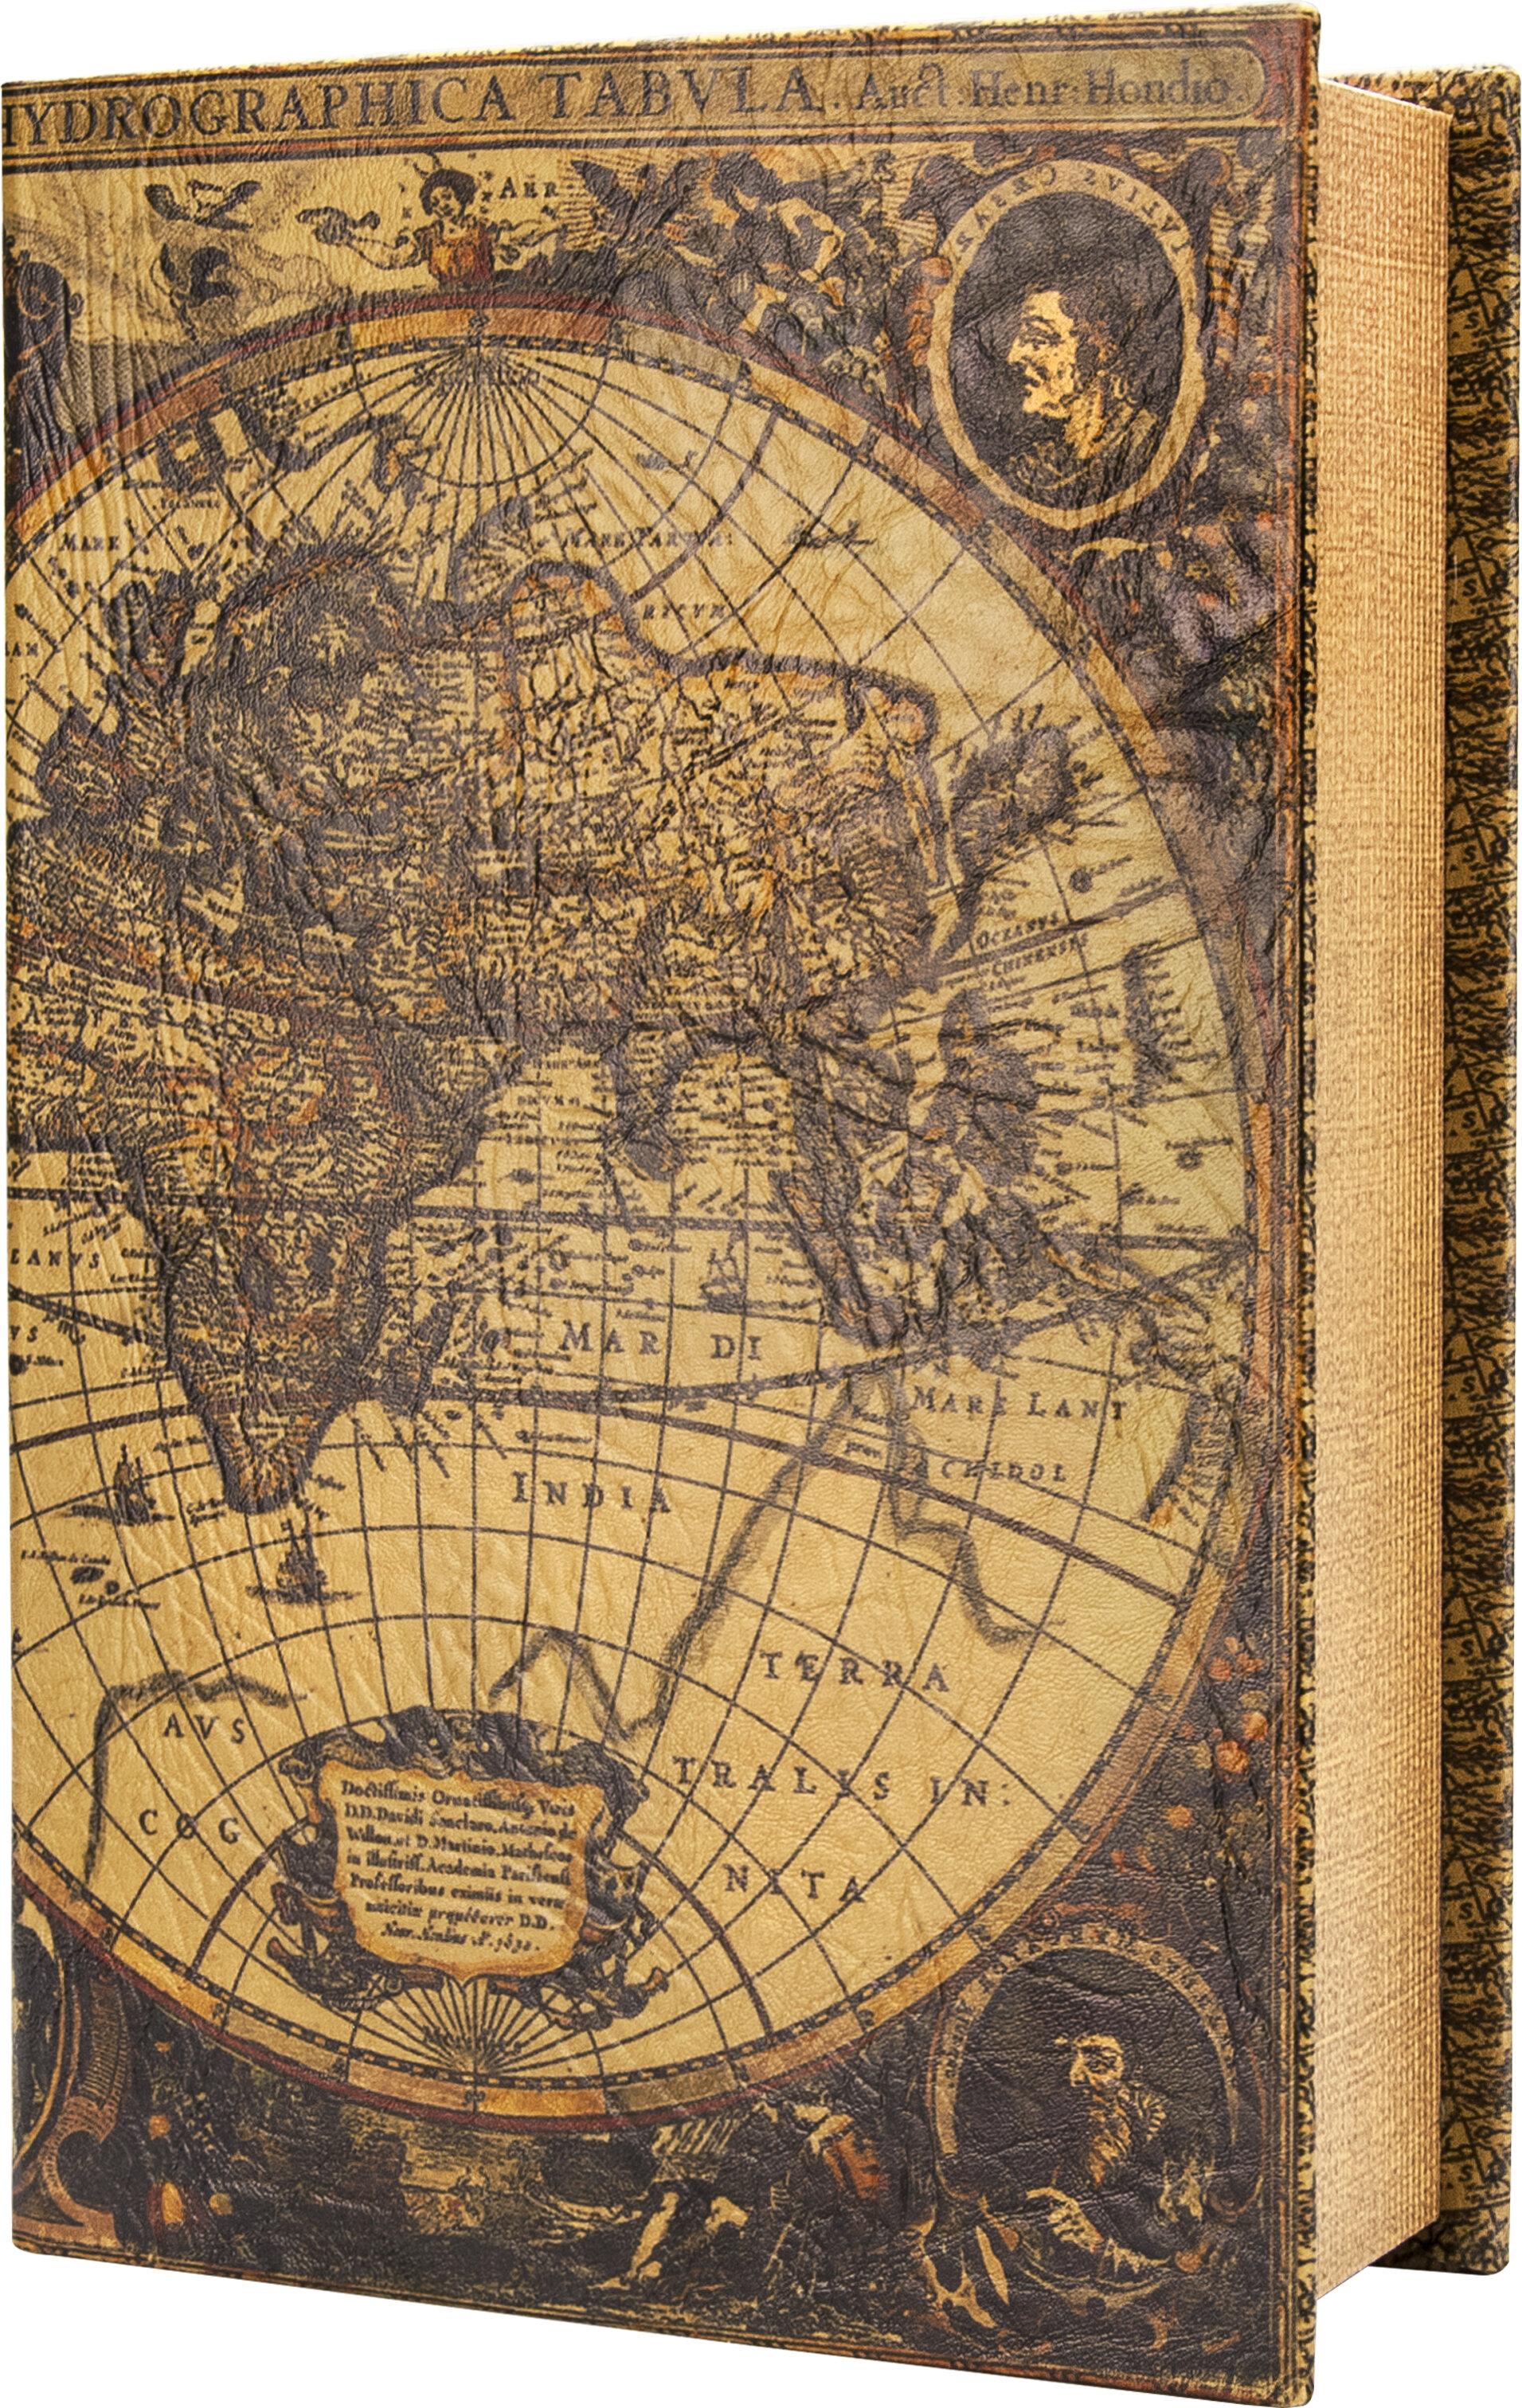 Barska Antique Map Book Cash Box With Key Lock Wayfair - Antique map box